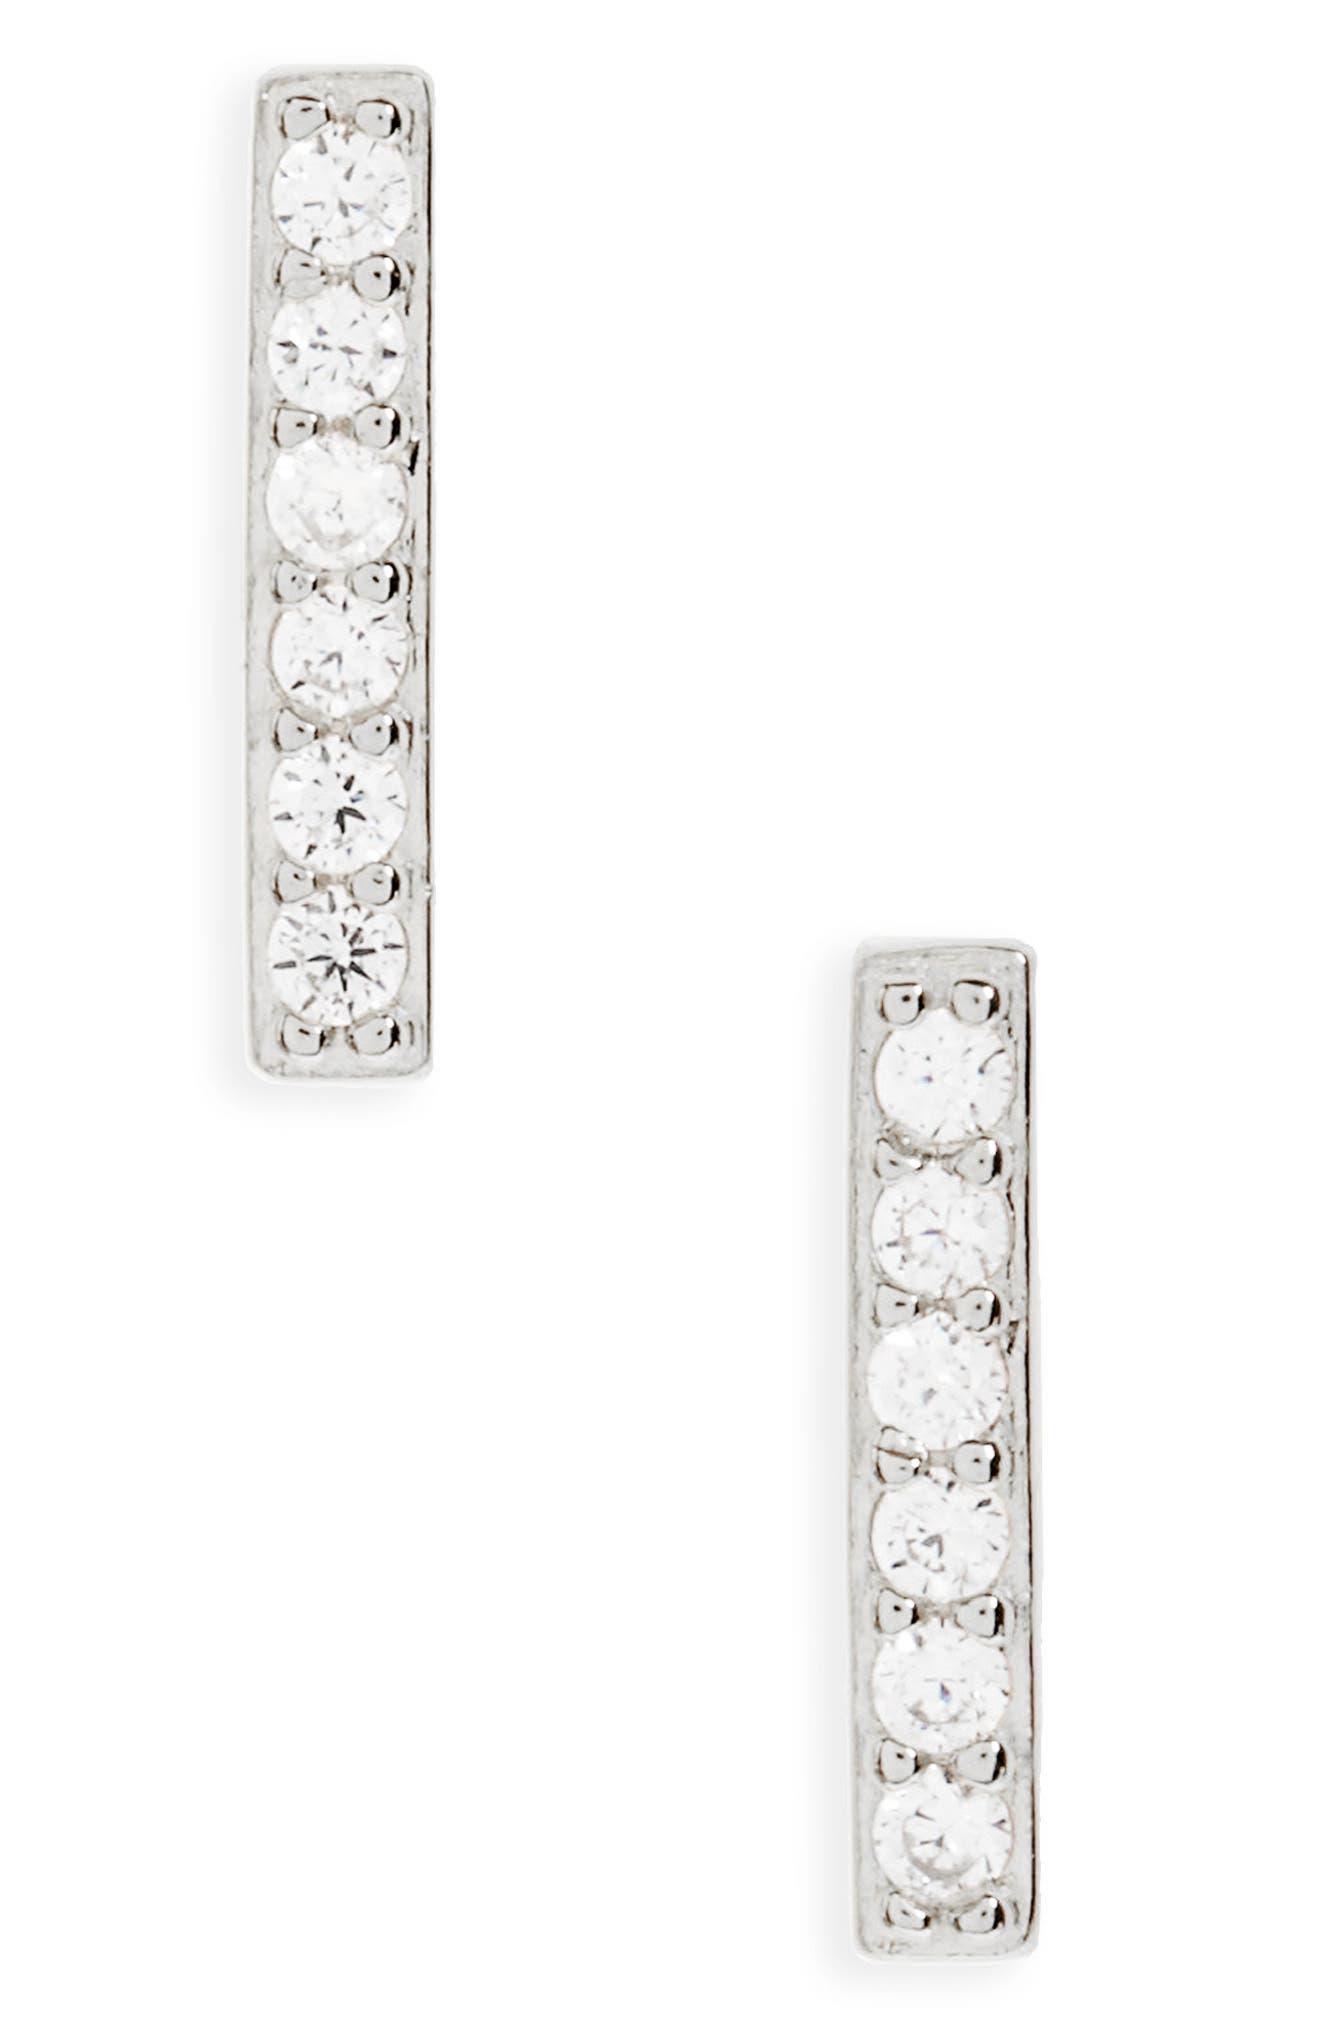 Precious Metal Plated Cubic Zirconia Bar Earrings,                             Main thumbnail 1, color,                             040